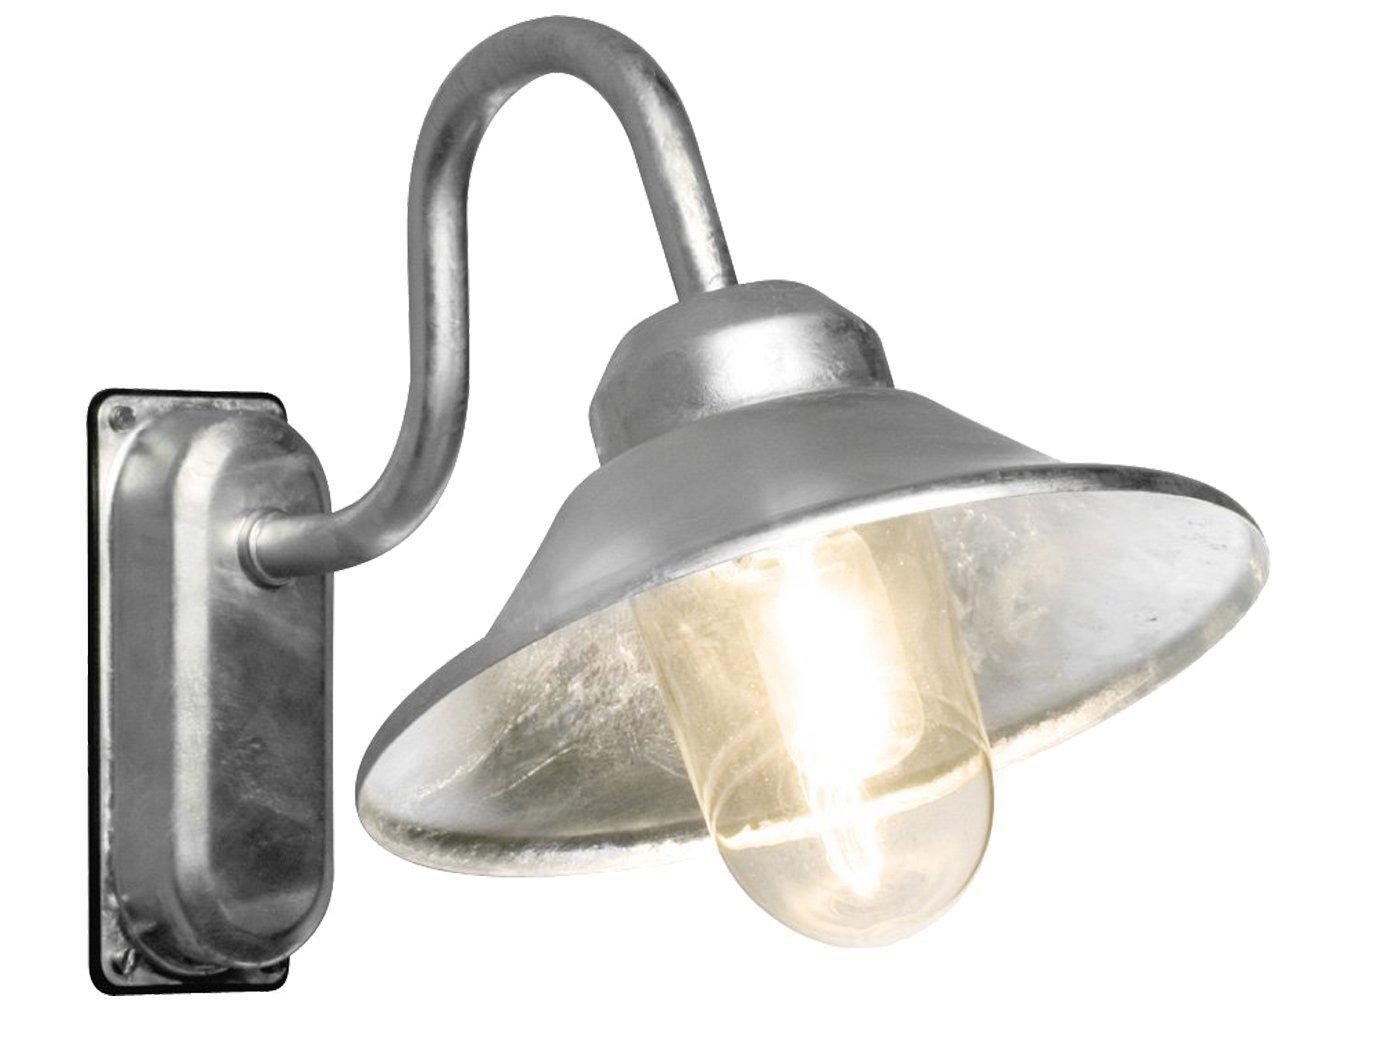 Konstsmide 556-320 Lampada a muro Clsssic Vega in alluminio